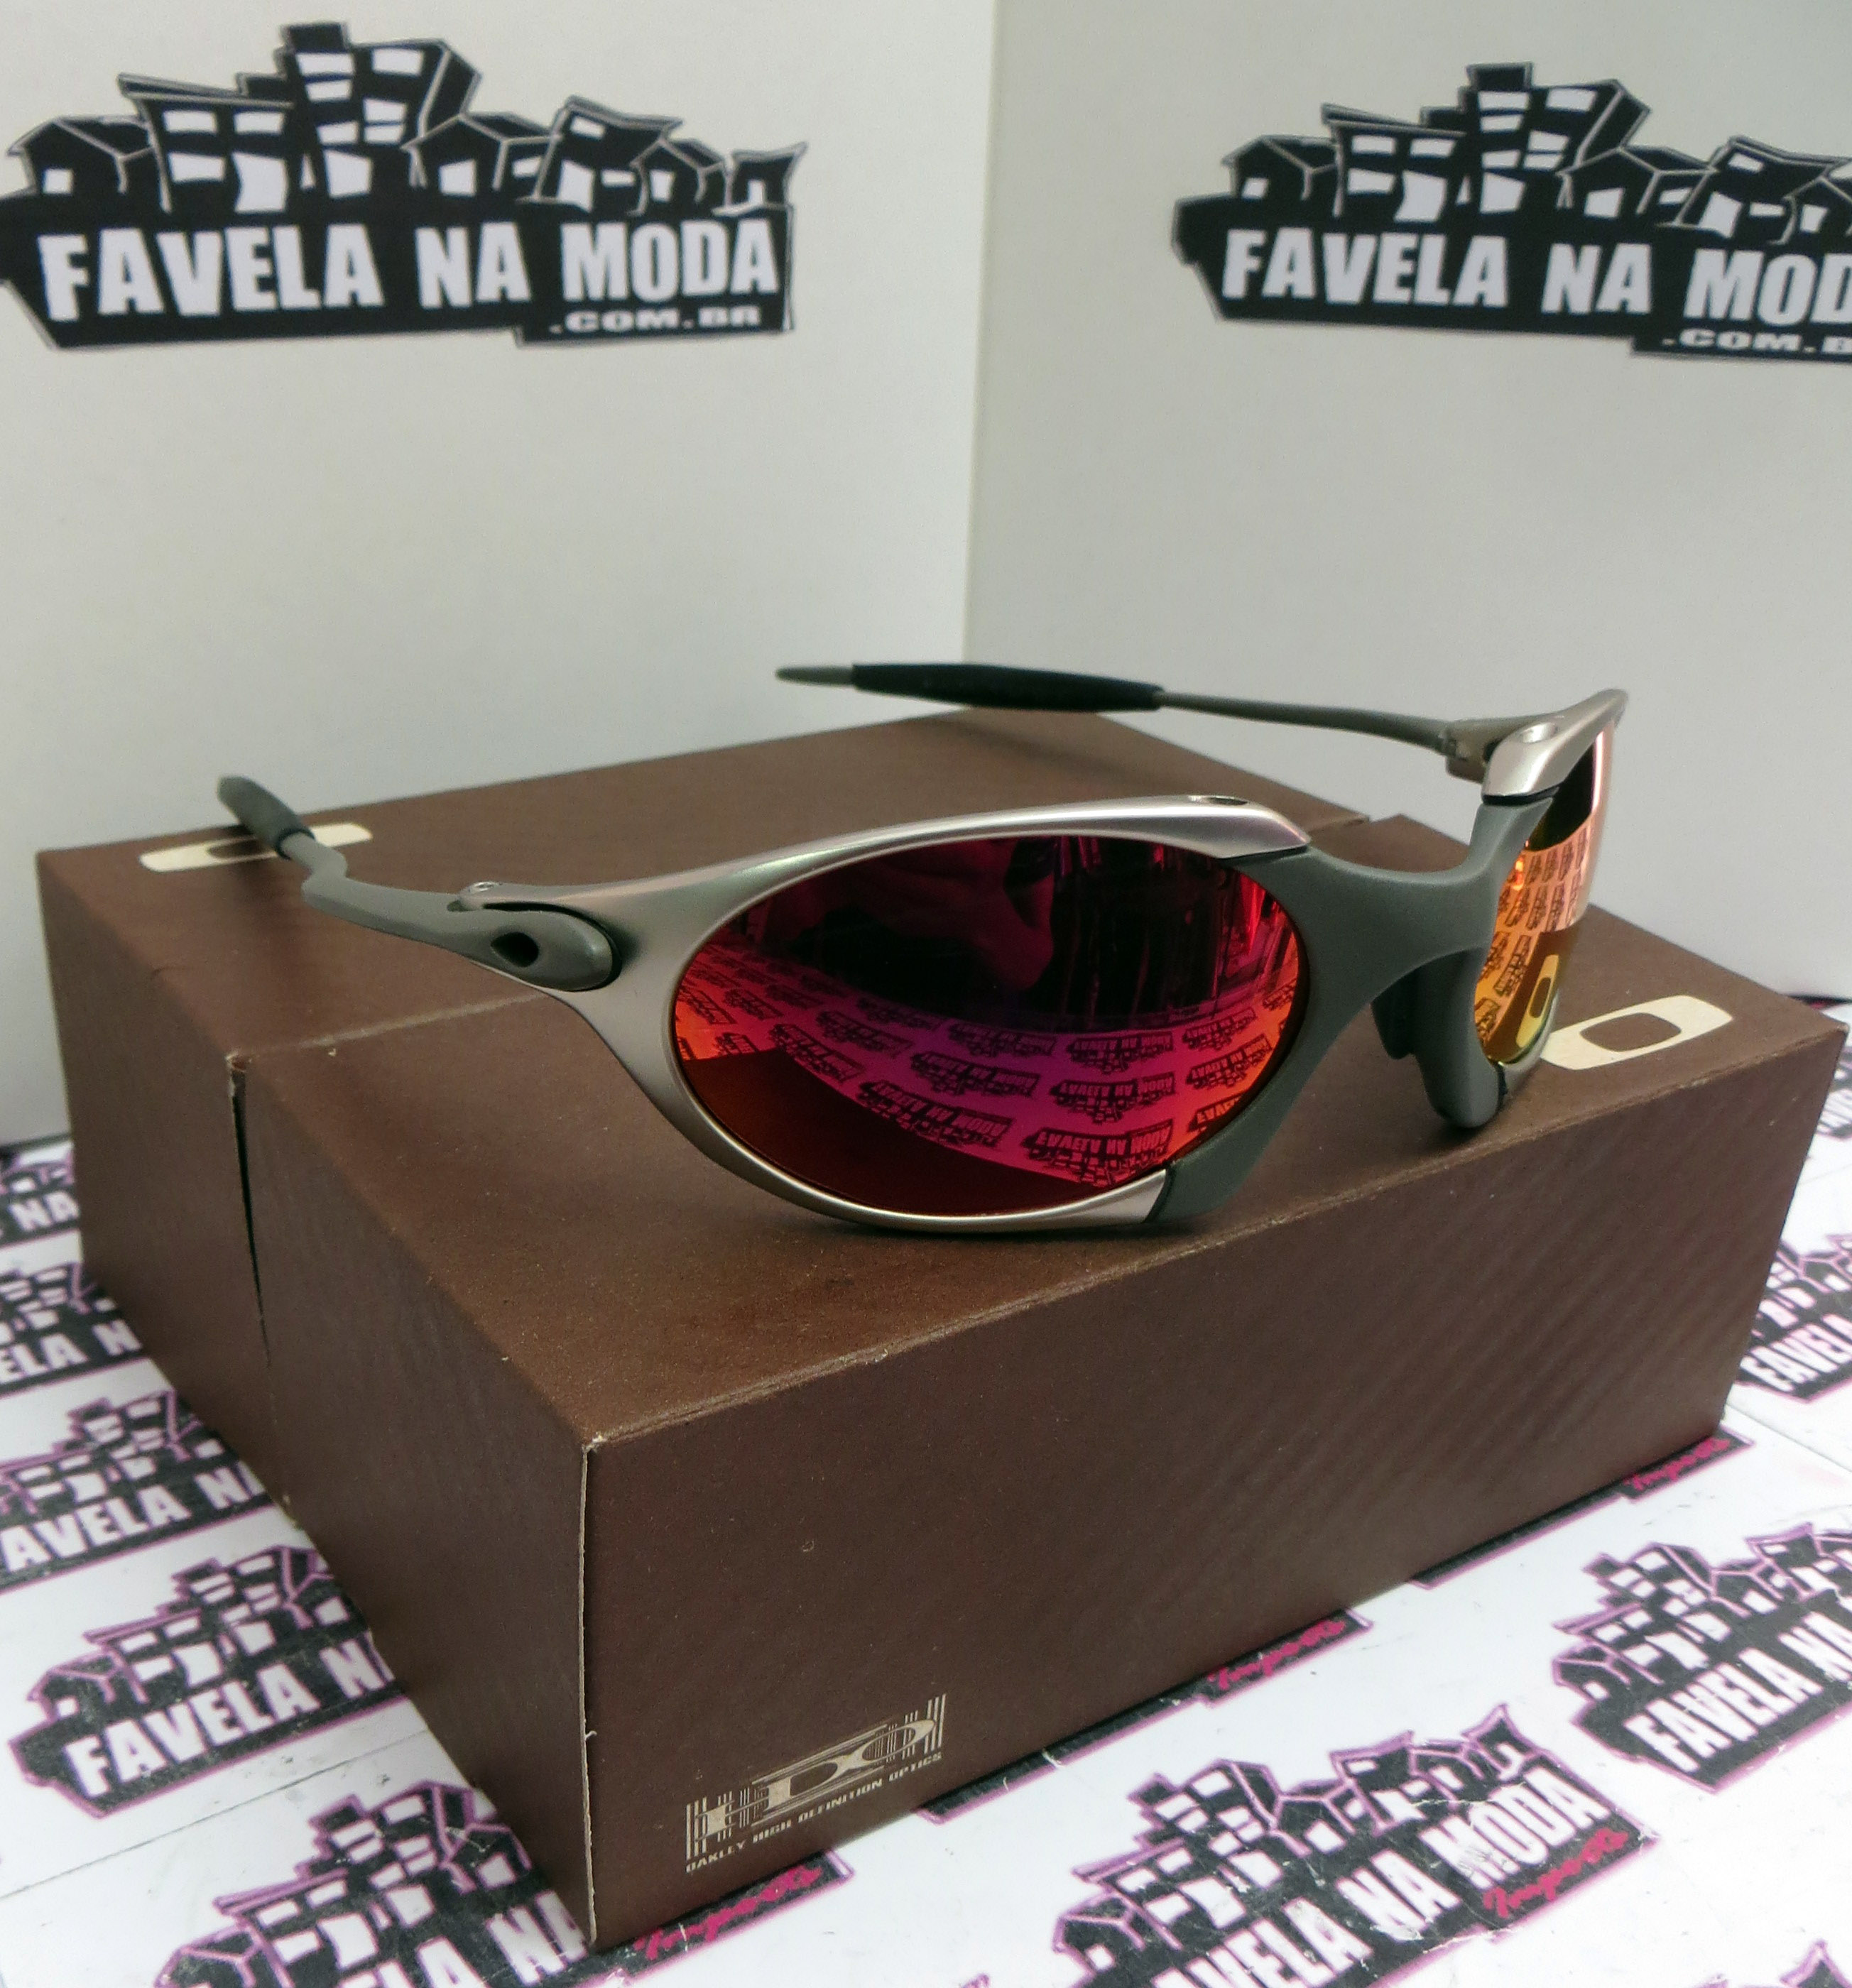 67e5422f9fa03 Óculos Oakley Romeo 1 - Tio 2 - Plasma e X-Metal   Dark Ruby ...